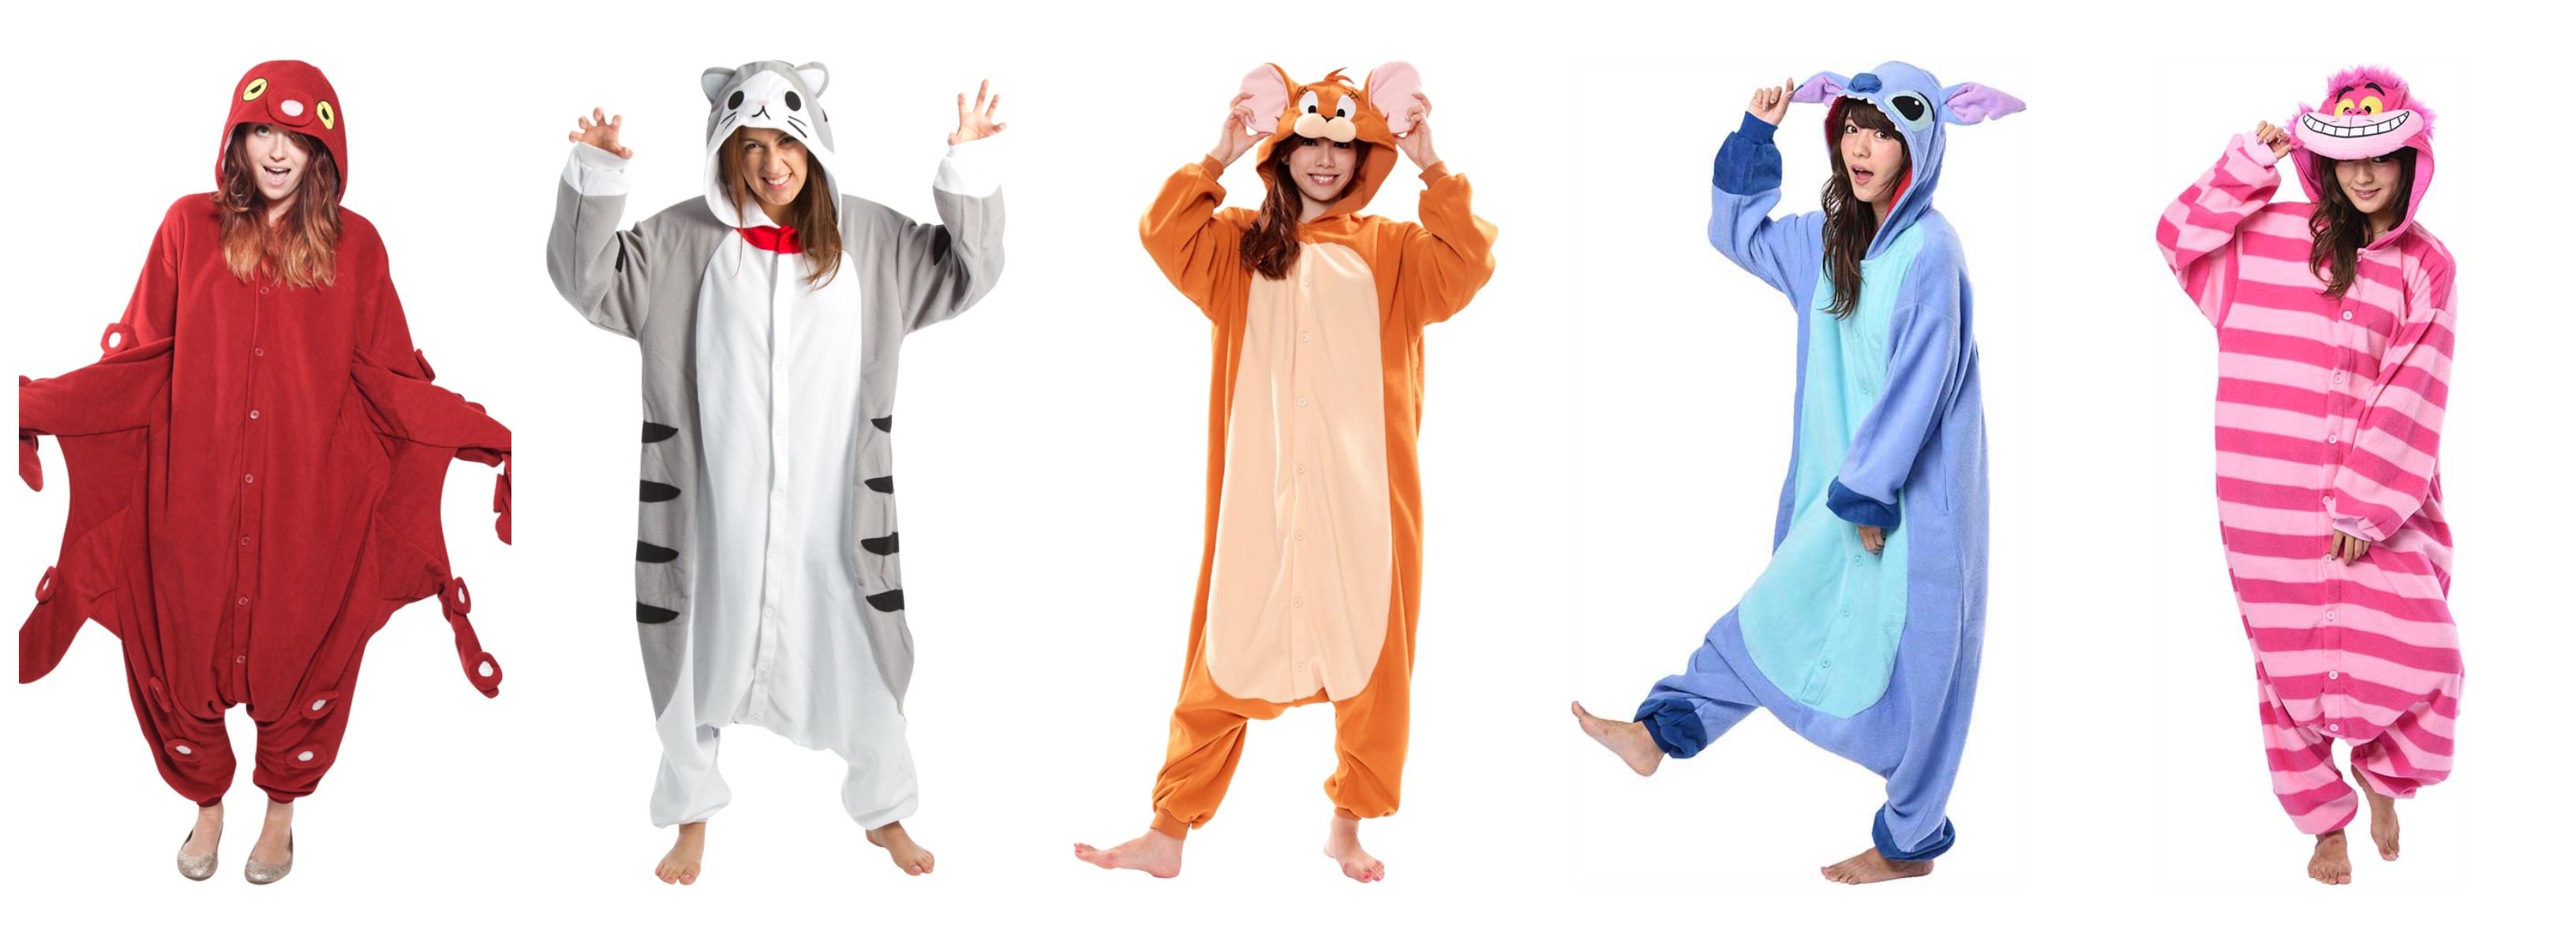 kigurumi kostume til voksne - Kigurumi til voksne - heldragt til voksne